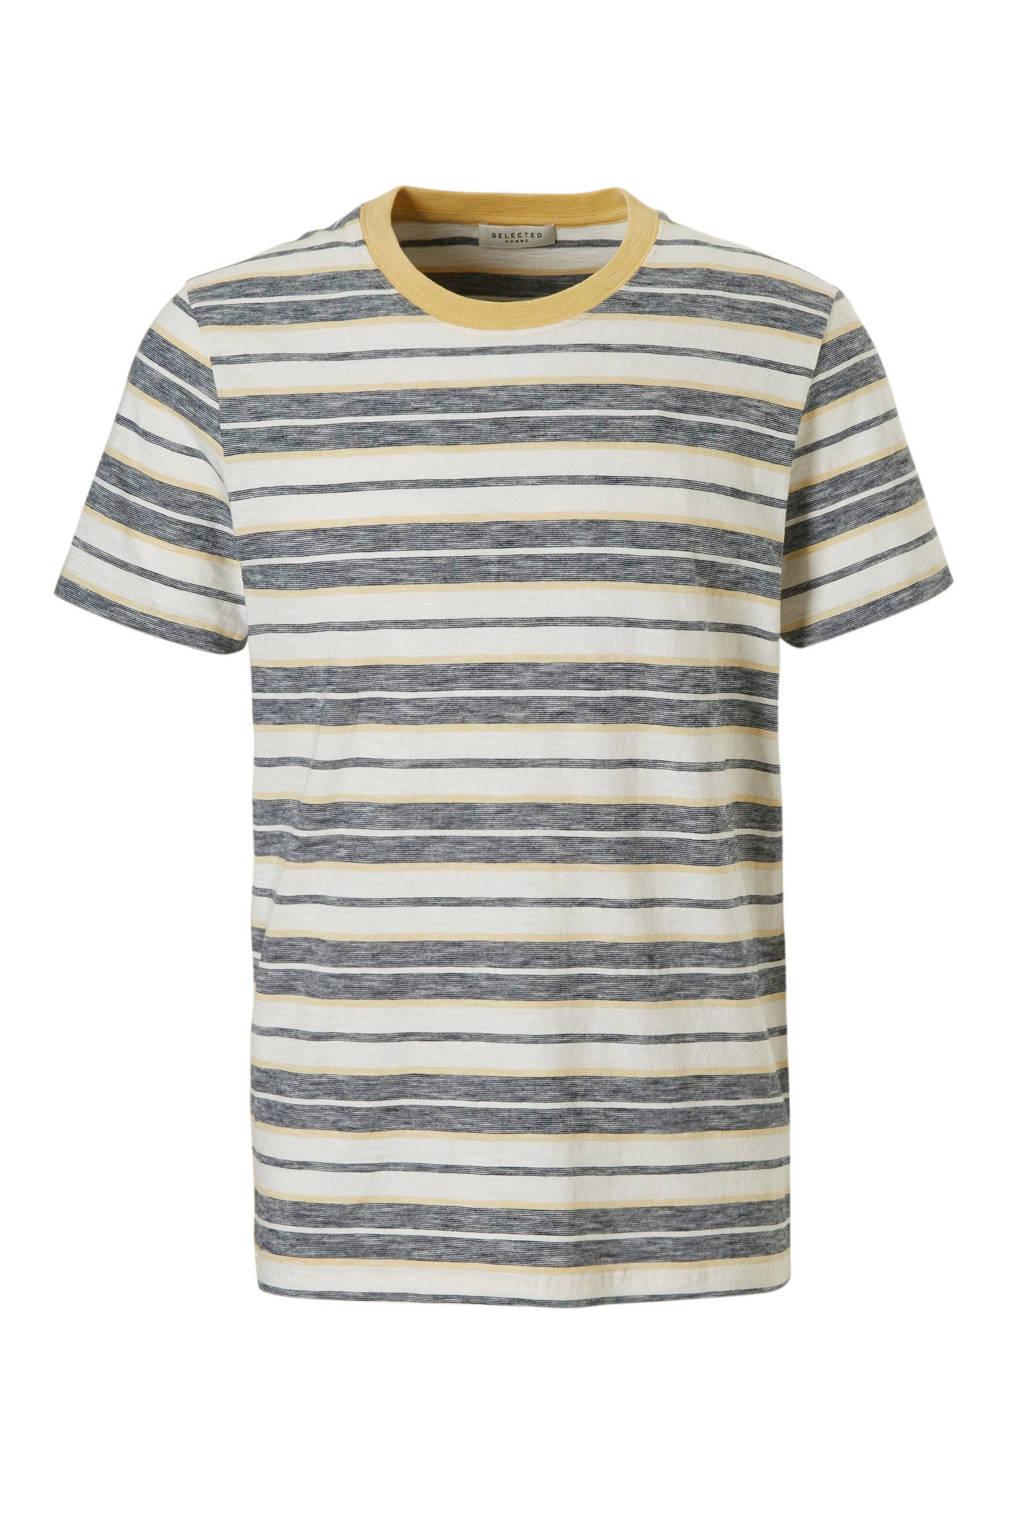 SELECTED HOMME T-shirt Kasper, Wit/geel